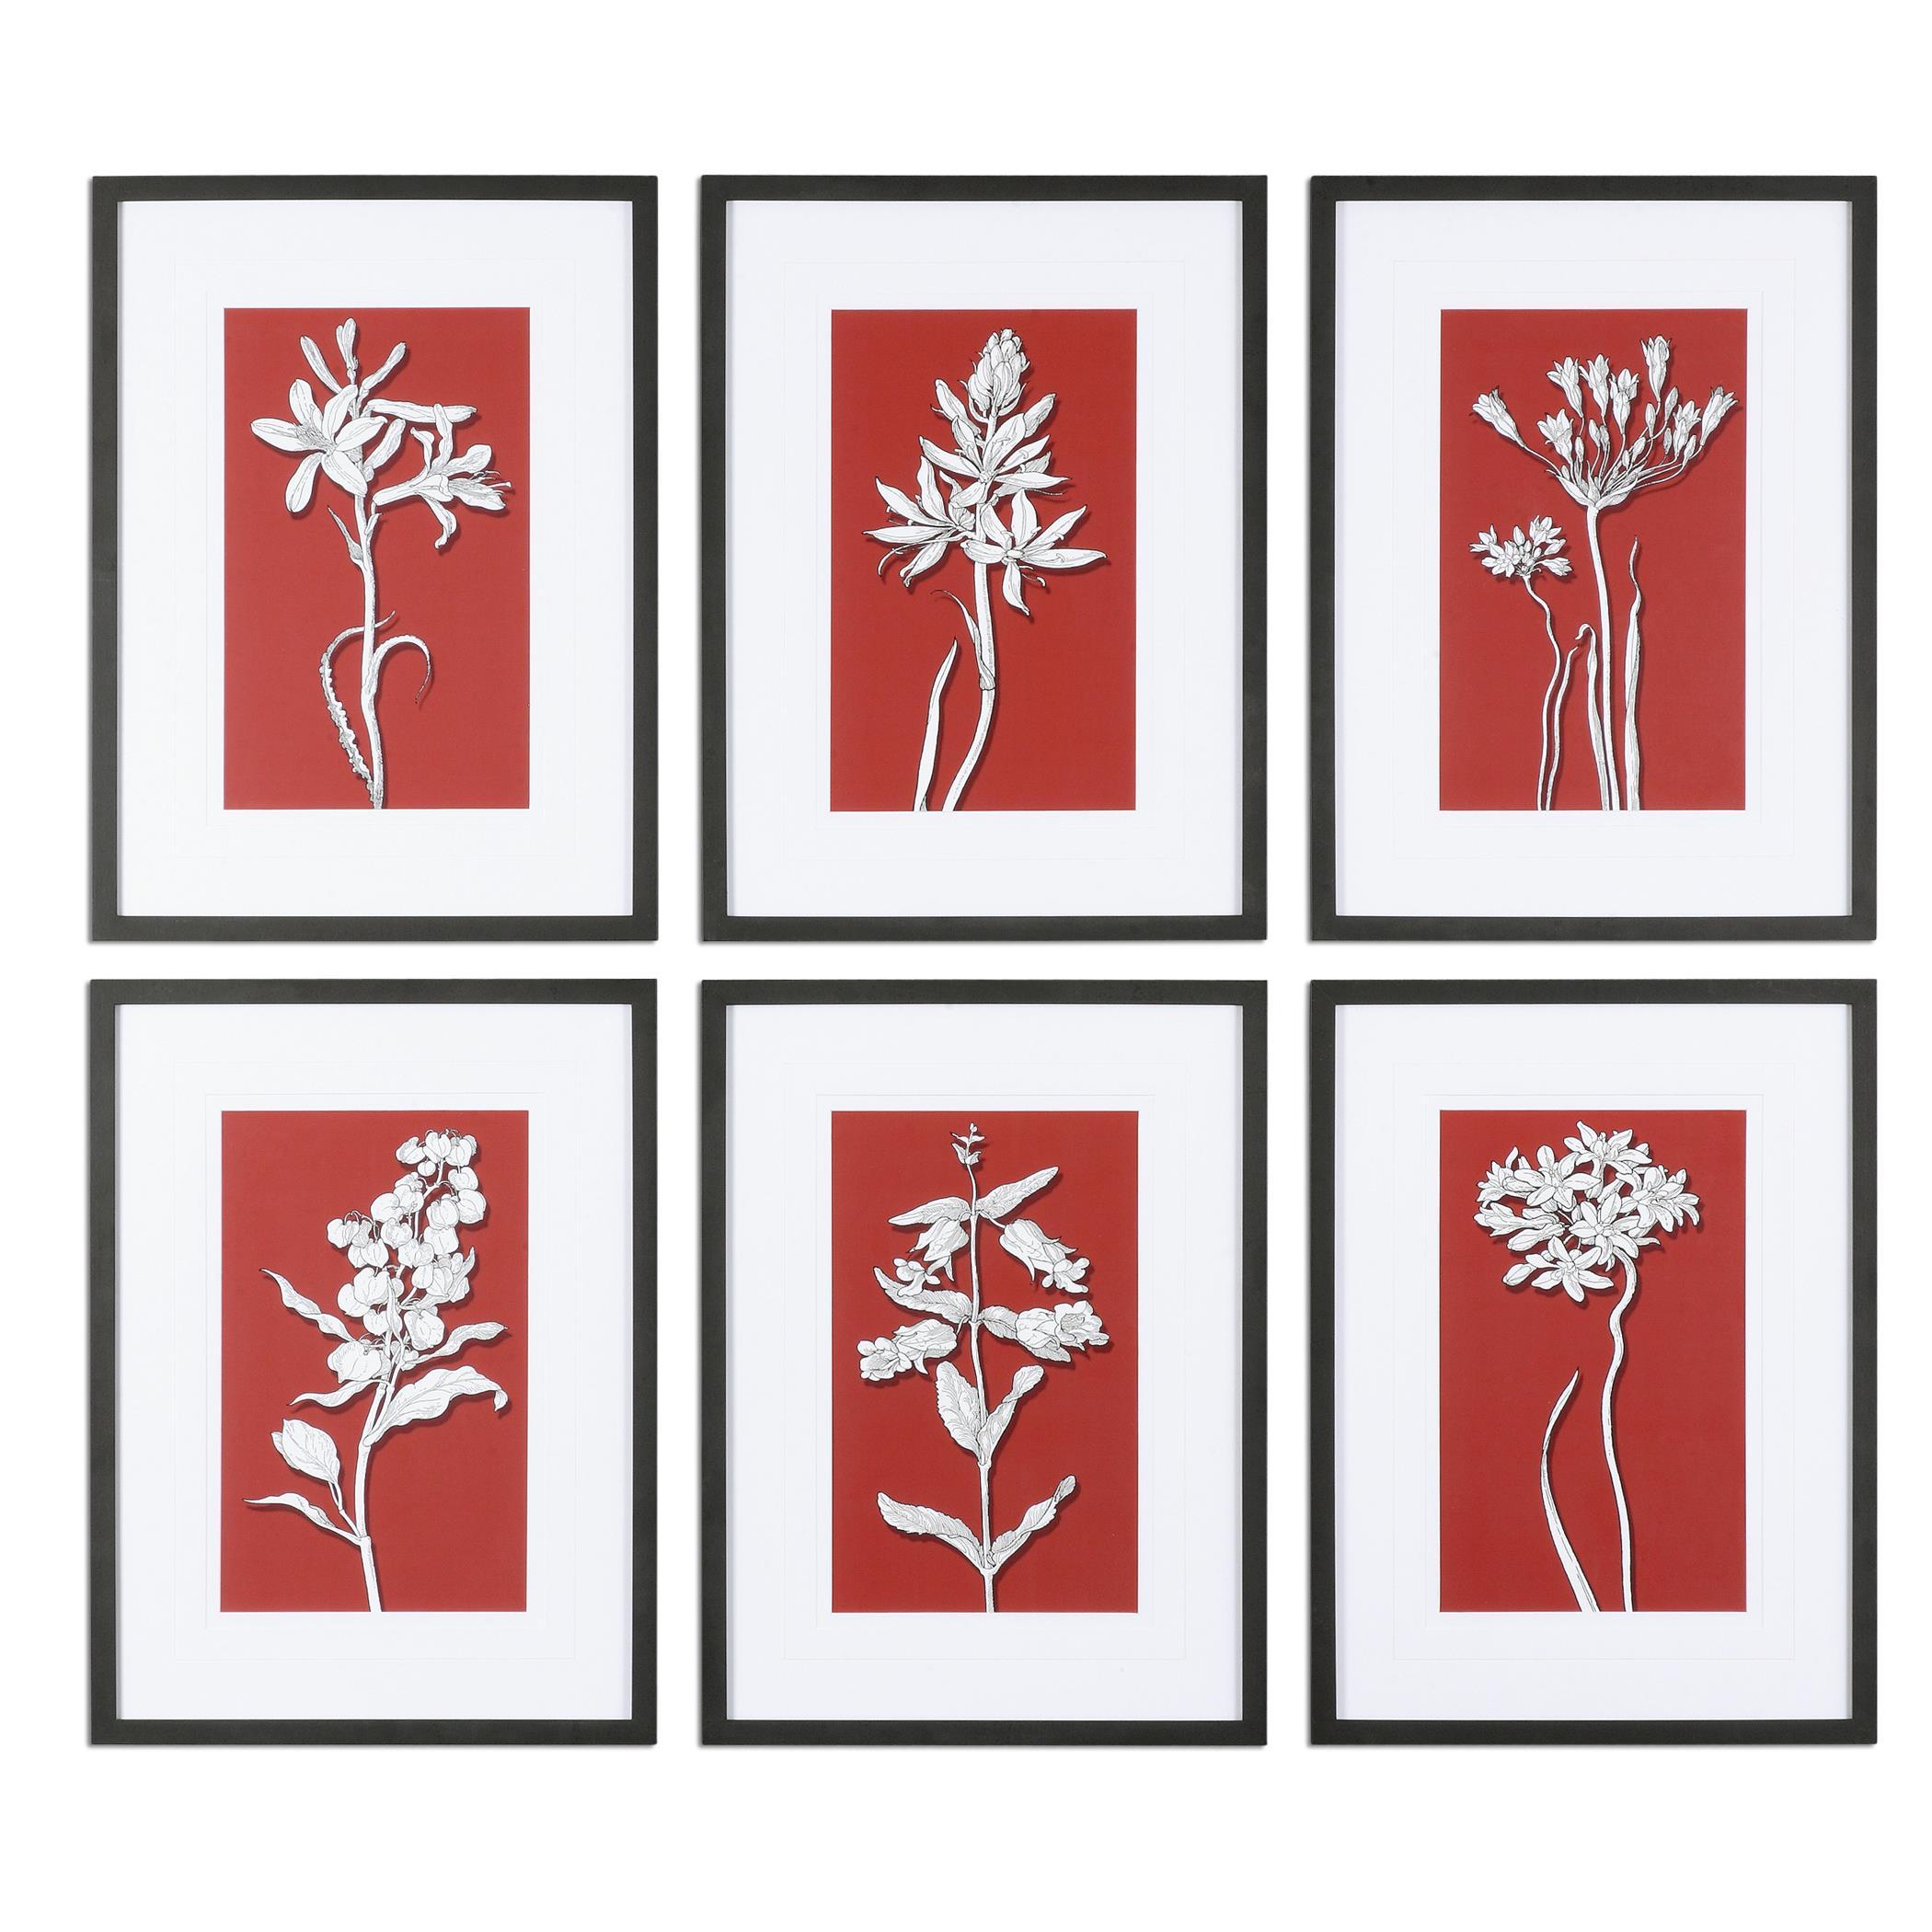 Uttermost Art Ghost Floral Prints, S/6 - Item Number: 33614